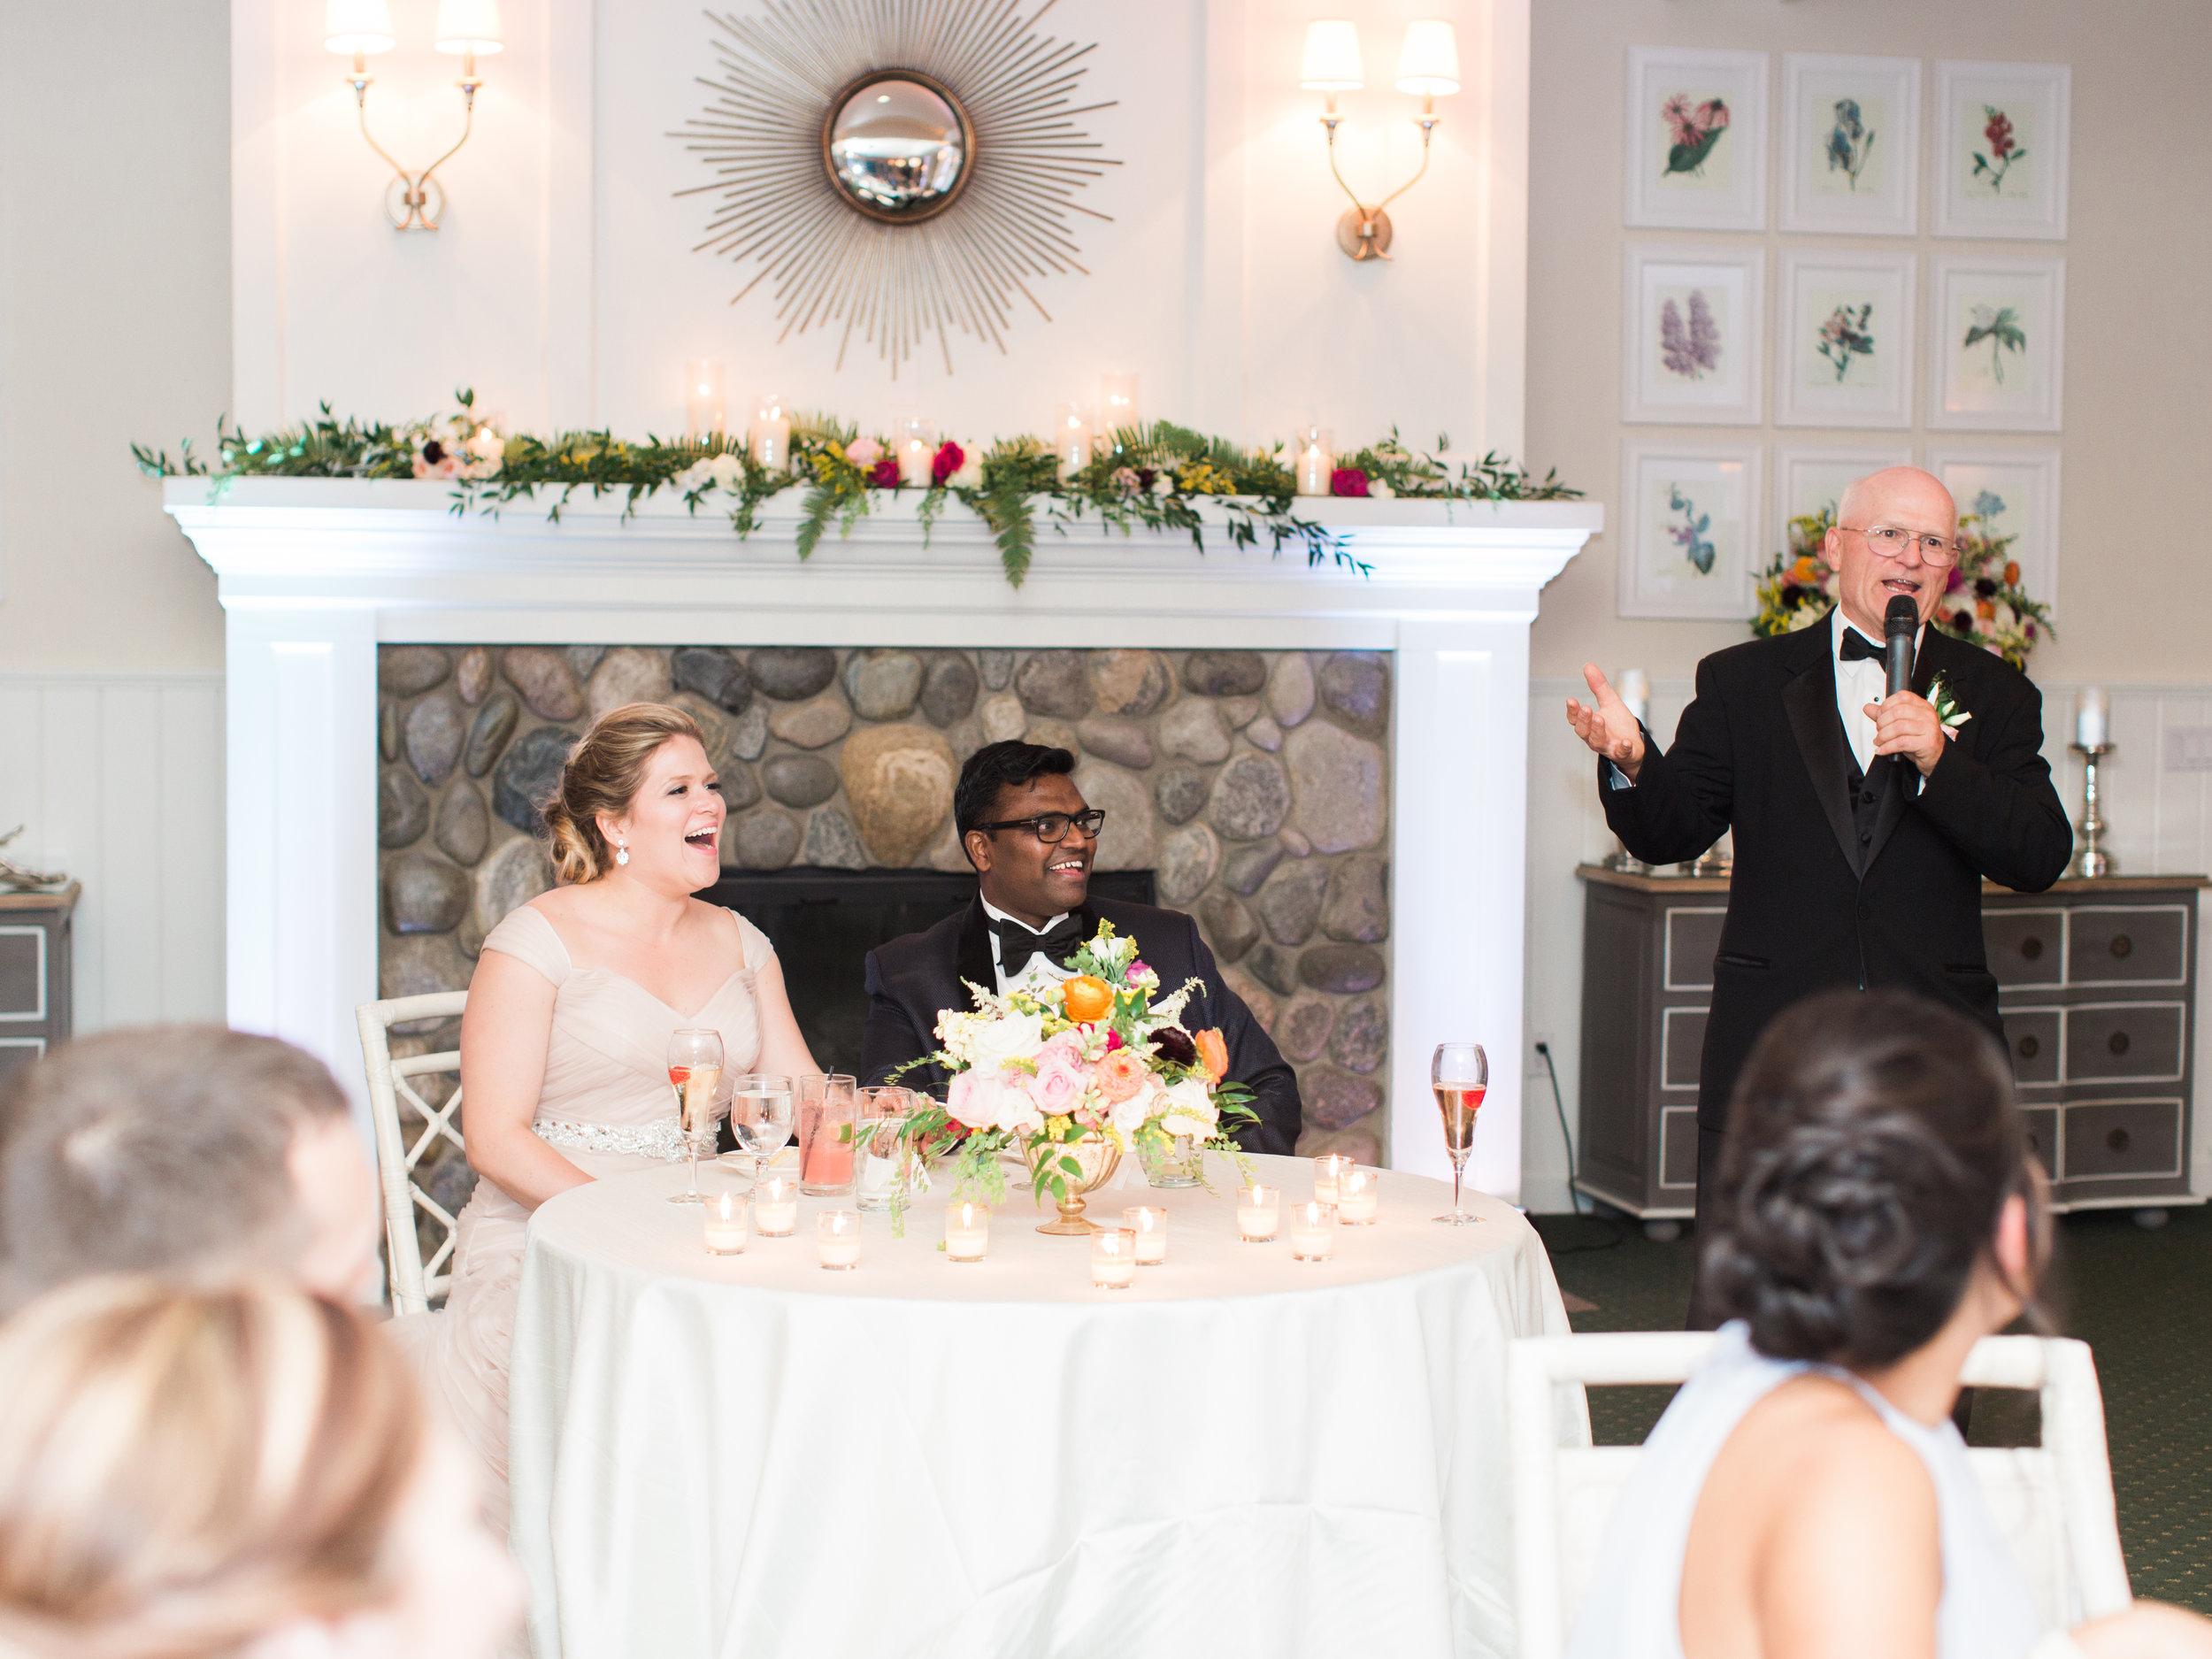 Govathoti+Wedding+Reception+Toasts-14.jpg